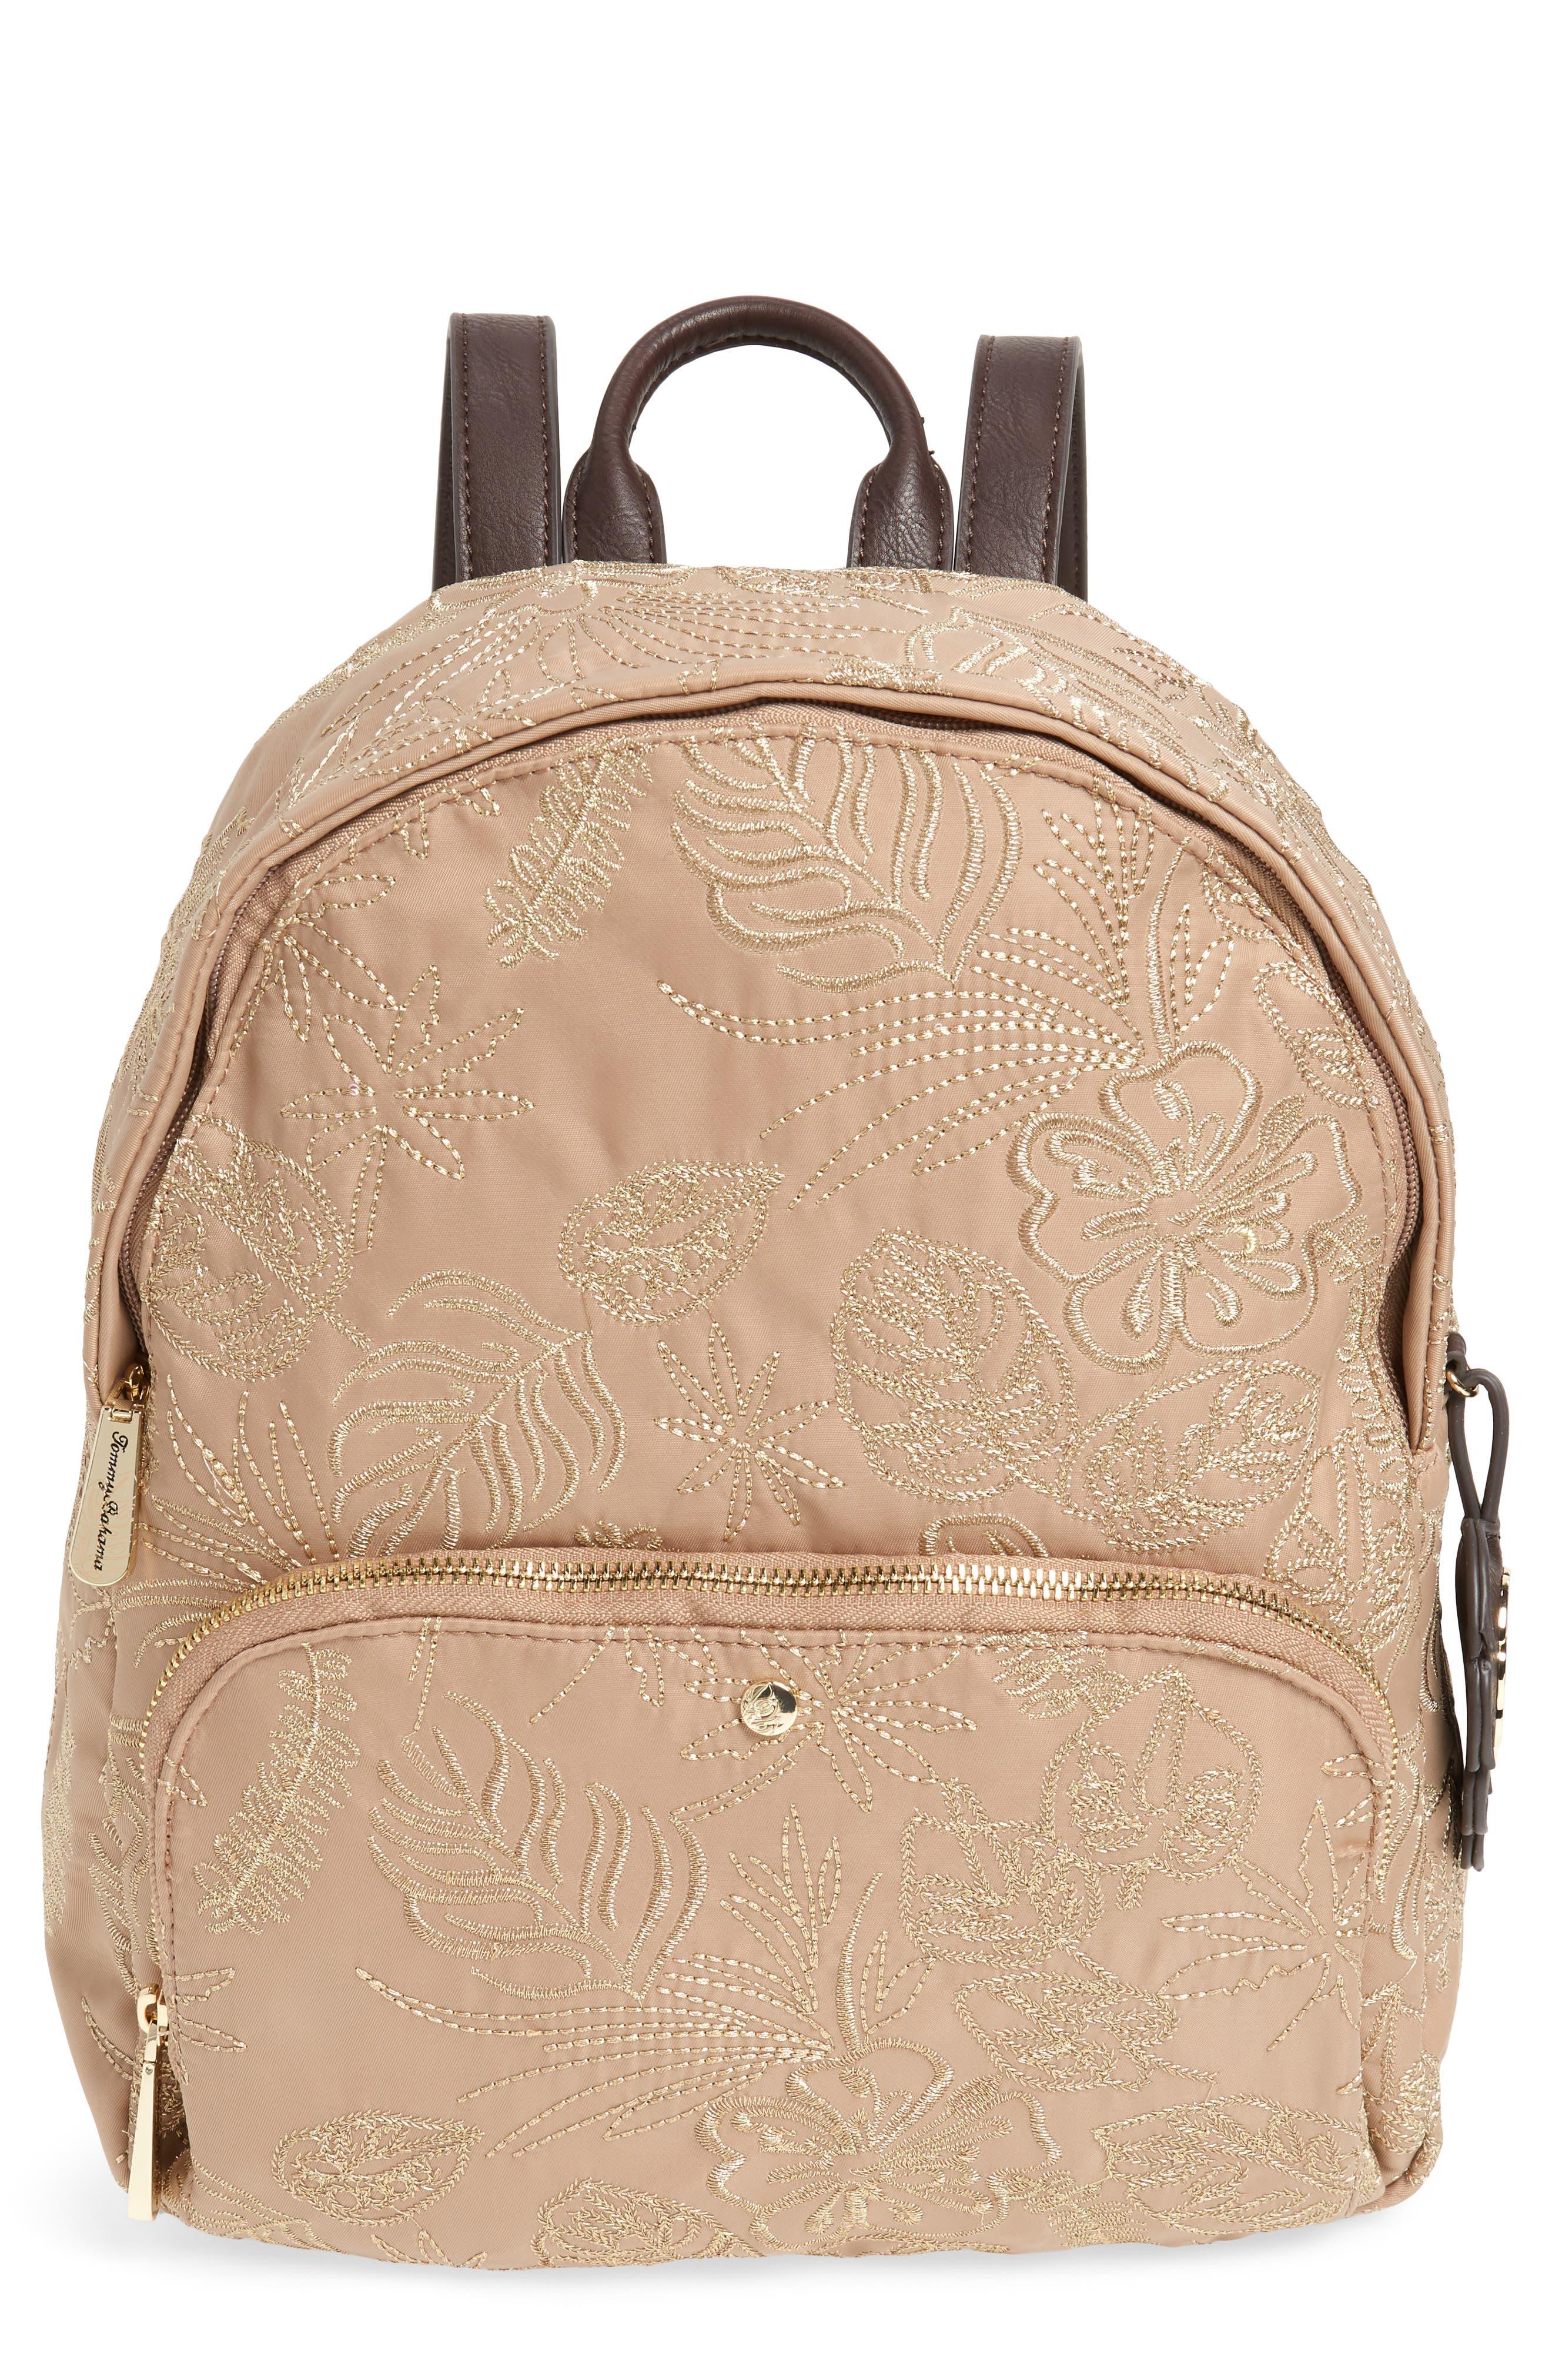 Siesta Key Backpack,                         Main,                         color, 230